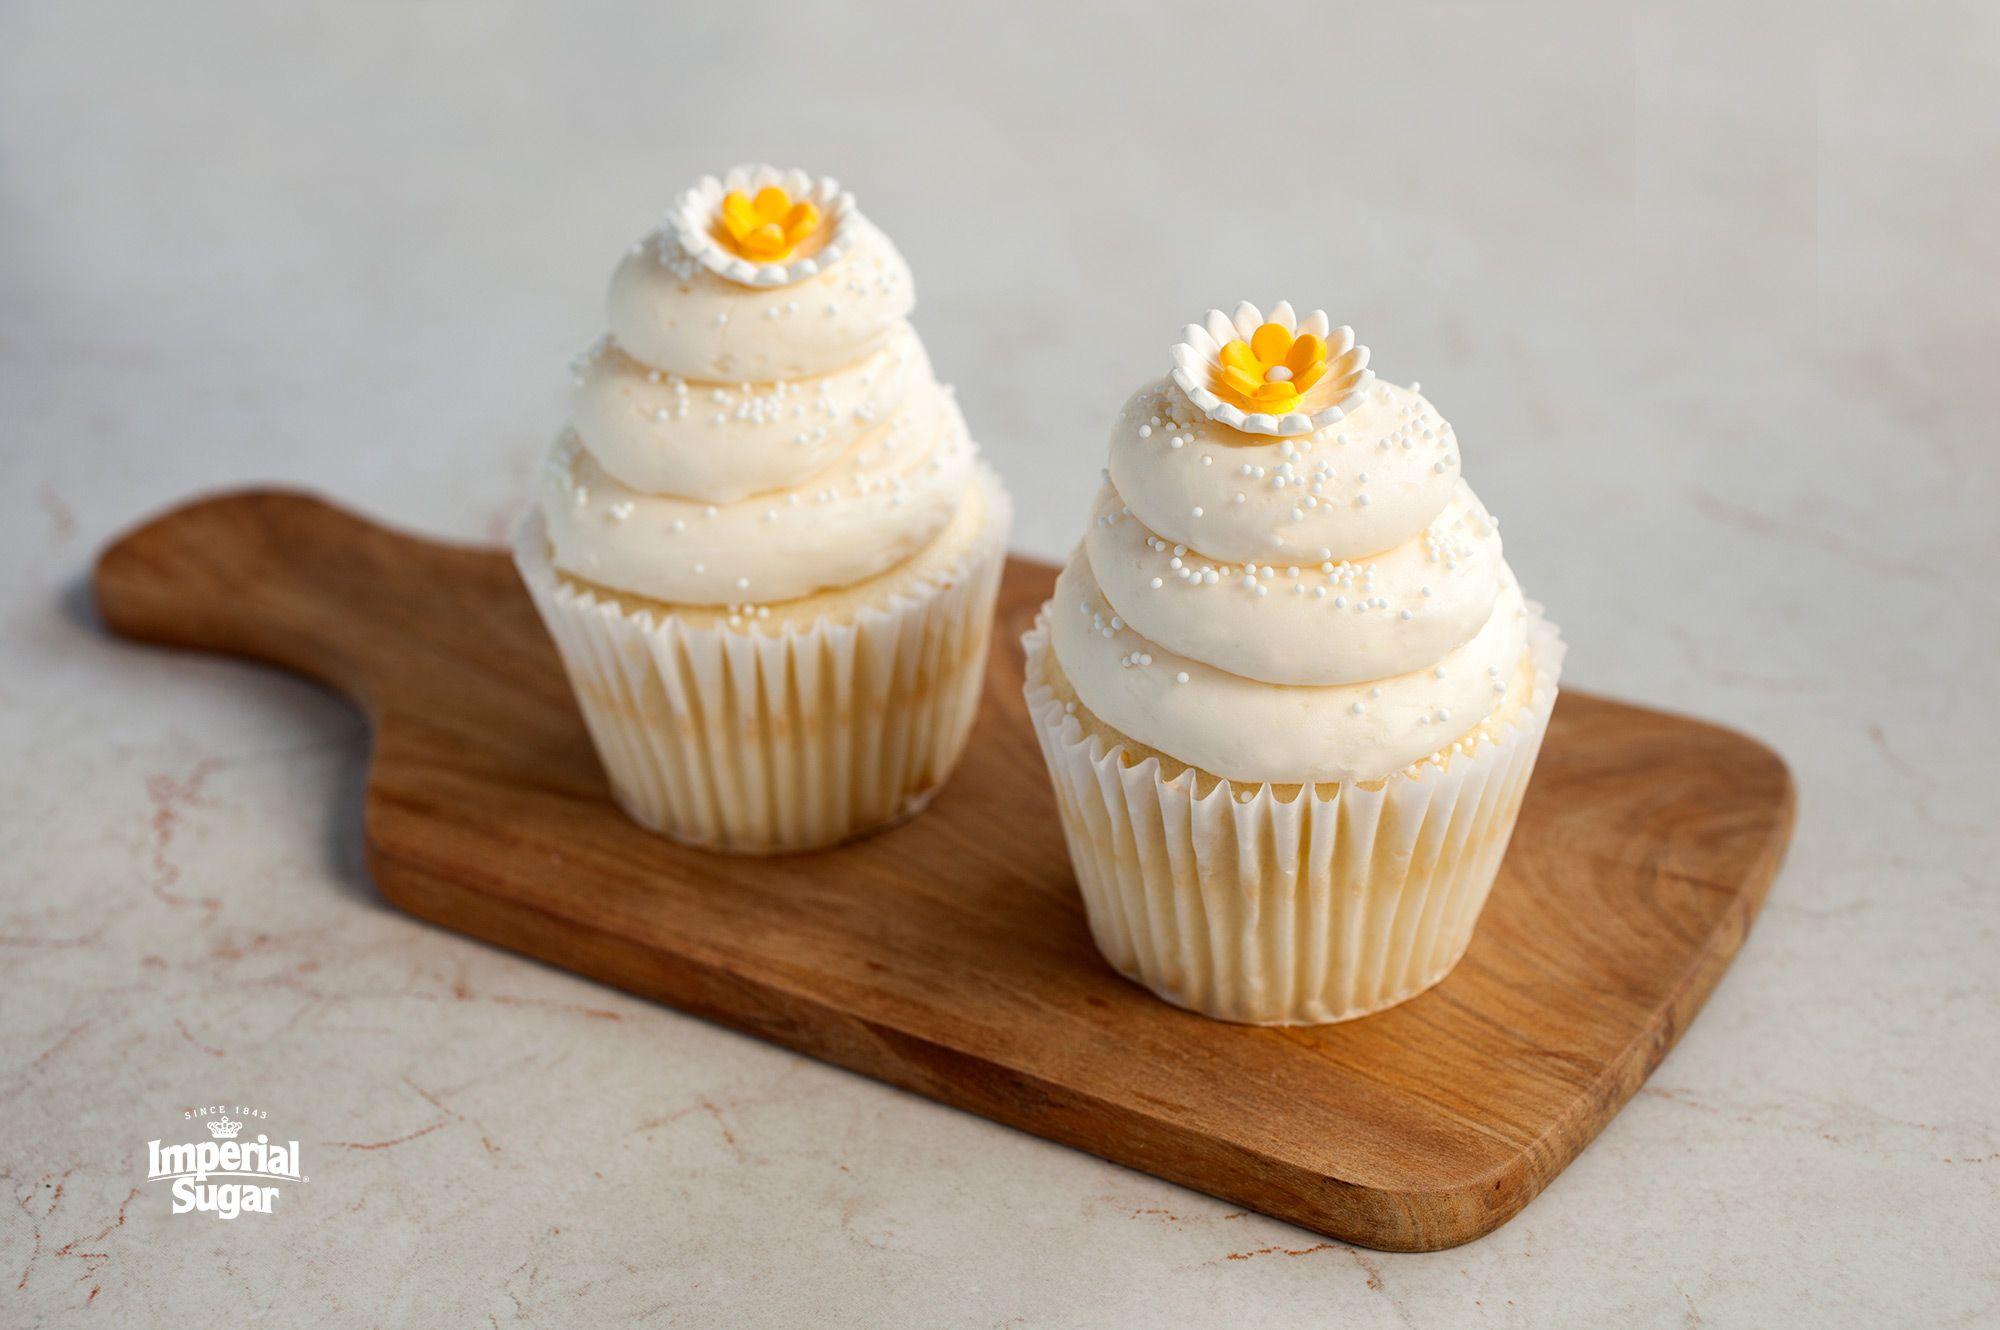 Sour Cream Frosting Imperial Sugar Recipe Sour Cream Frosting Homemade Sour Cream Frosting Recipes